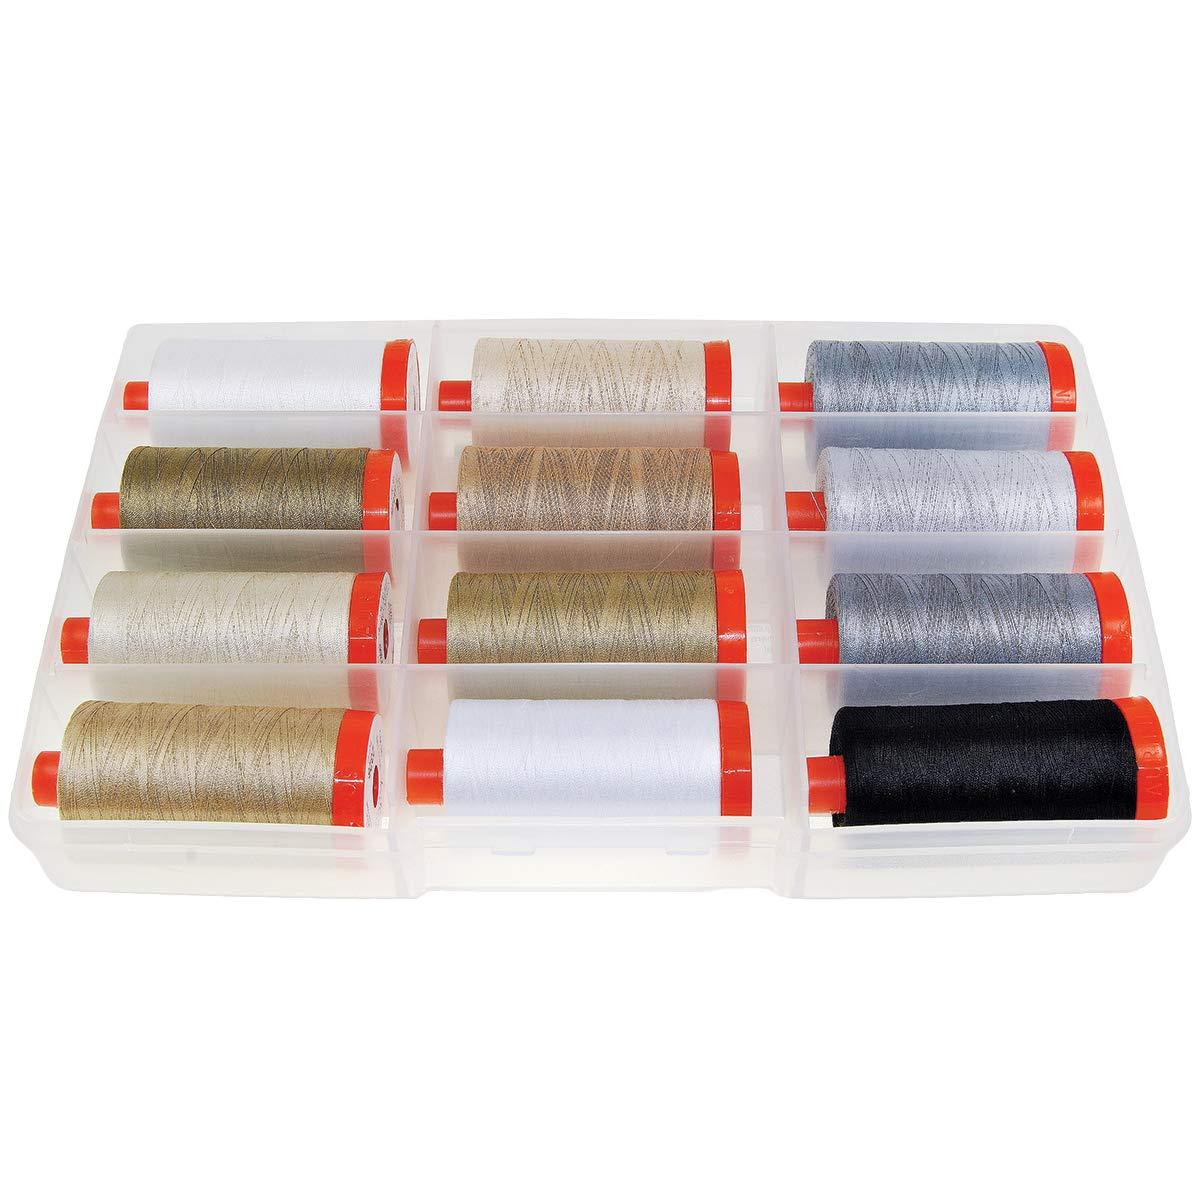 Aurifil Thread THE BASICS COLLECTION by Mark Lipinski 50wt Cotton 12 Large Spools 1300m each by Aurifil   B0054LDMFK